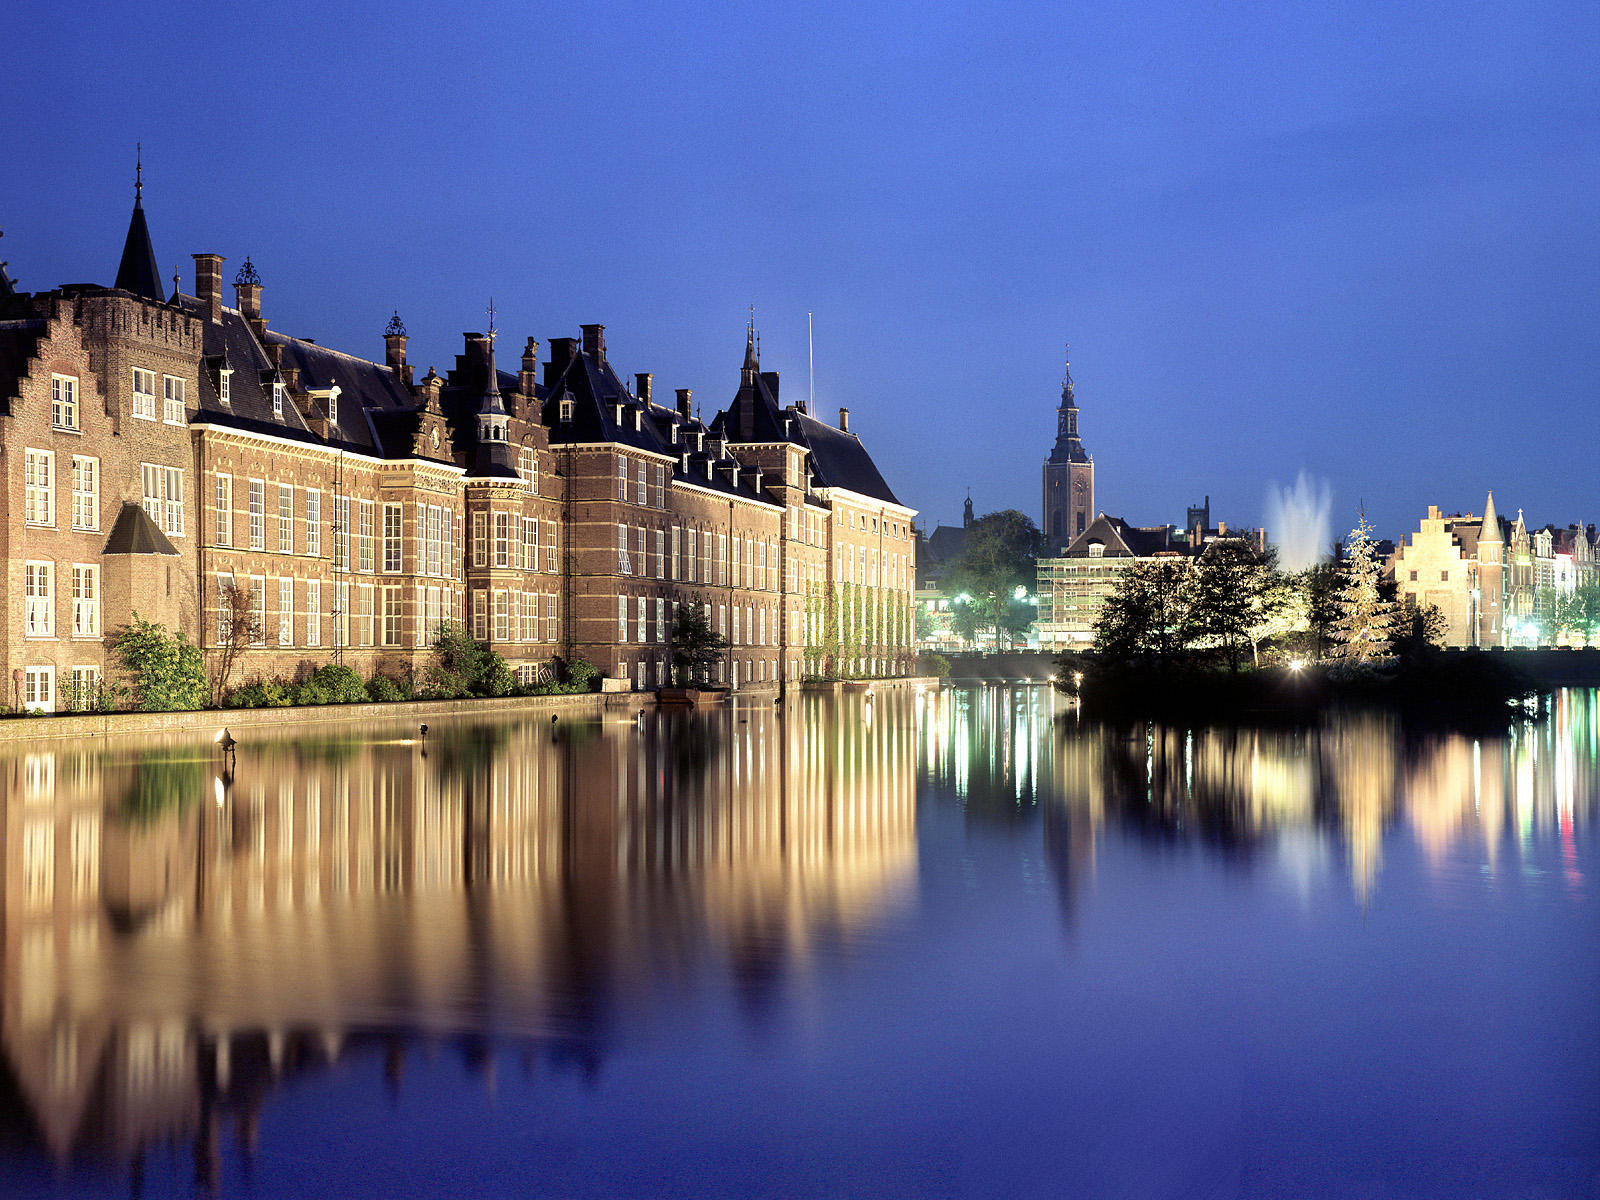 TOP WORLD TRAVEL DESTINATIONS: The Hague, Netherlands